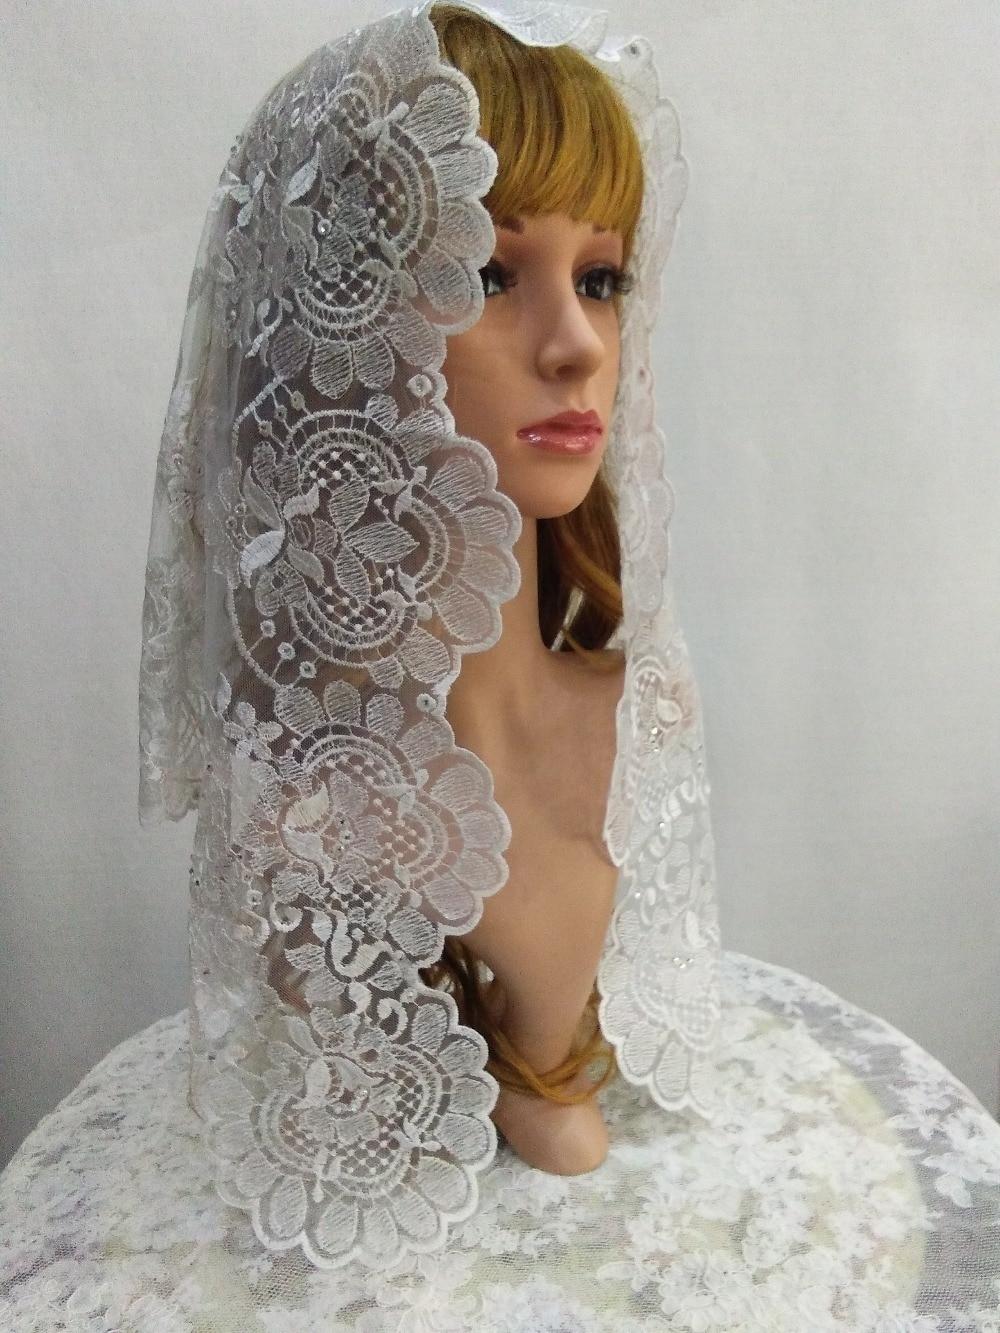 White Embroidery Spanish Lace Mantilla Veil with shinning beads Catholic Veils